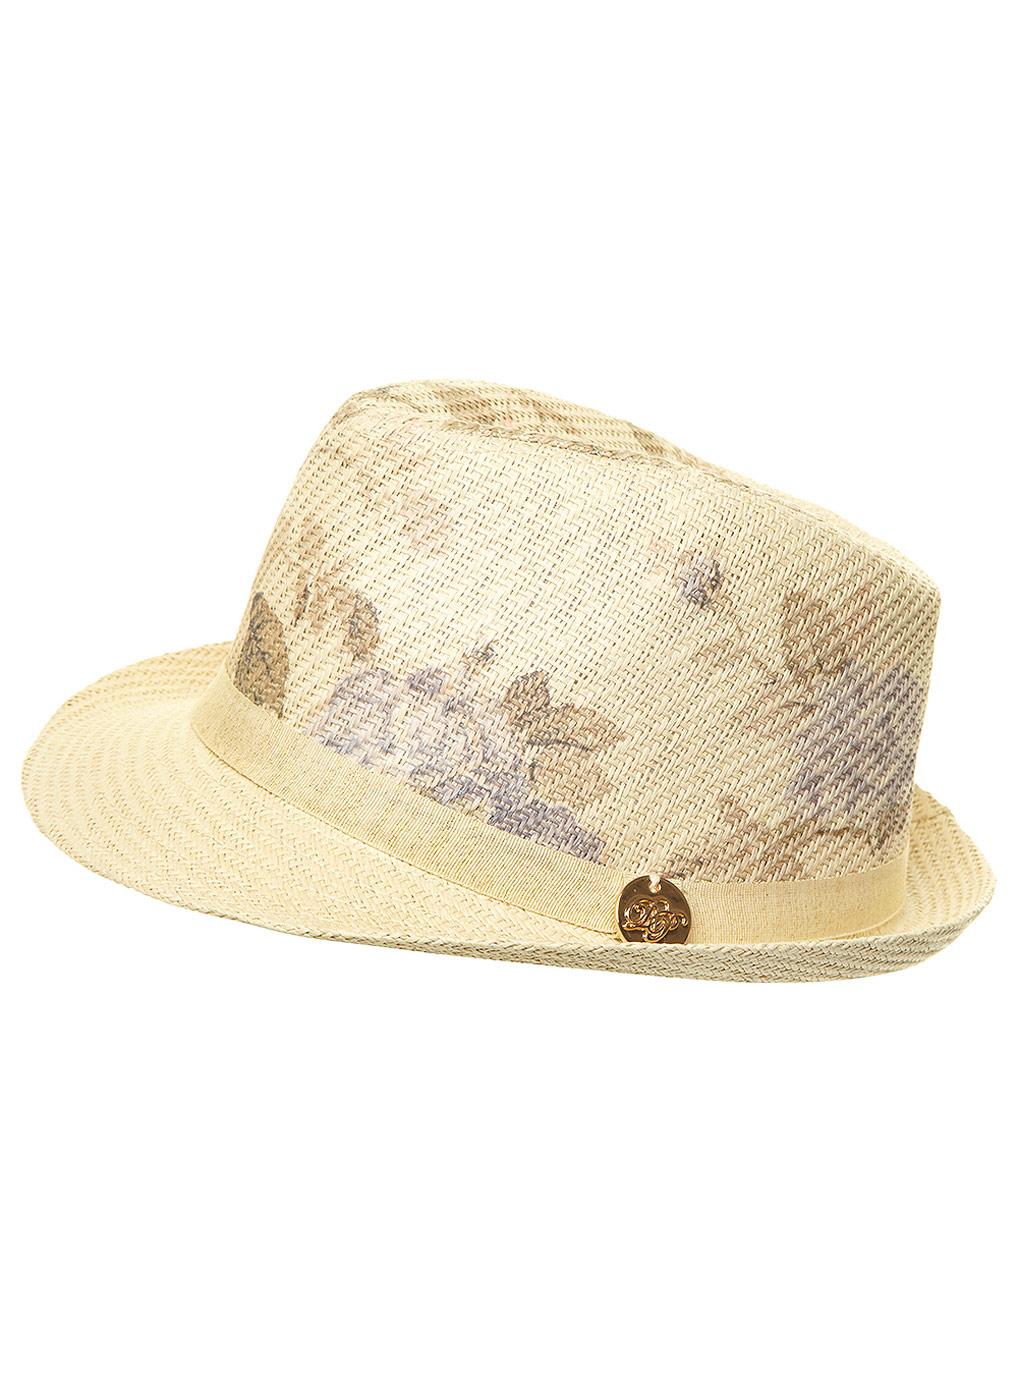 Dorothy Perkins hat